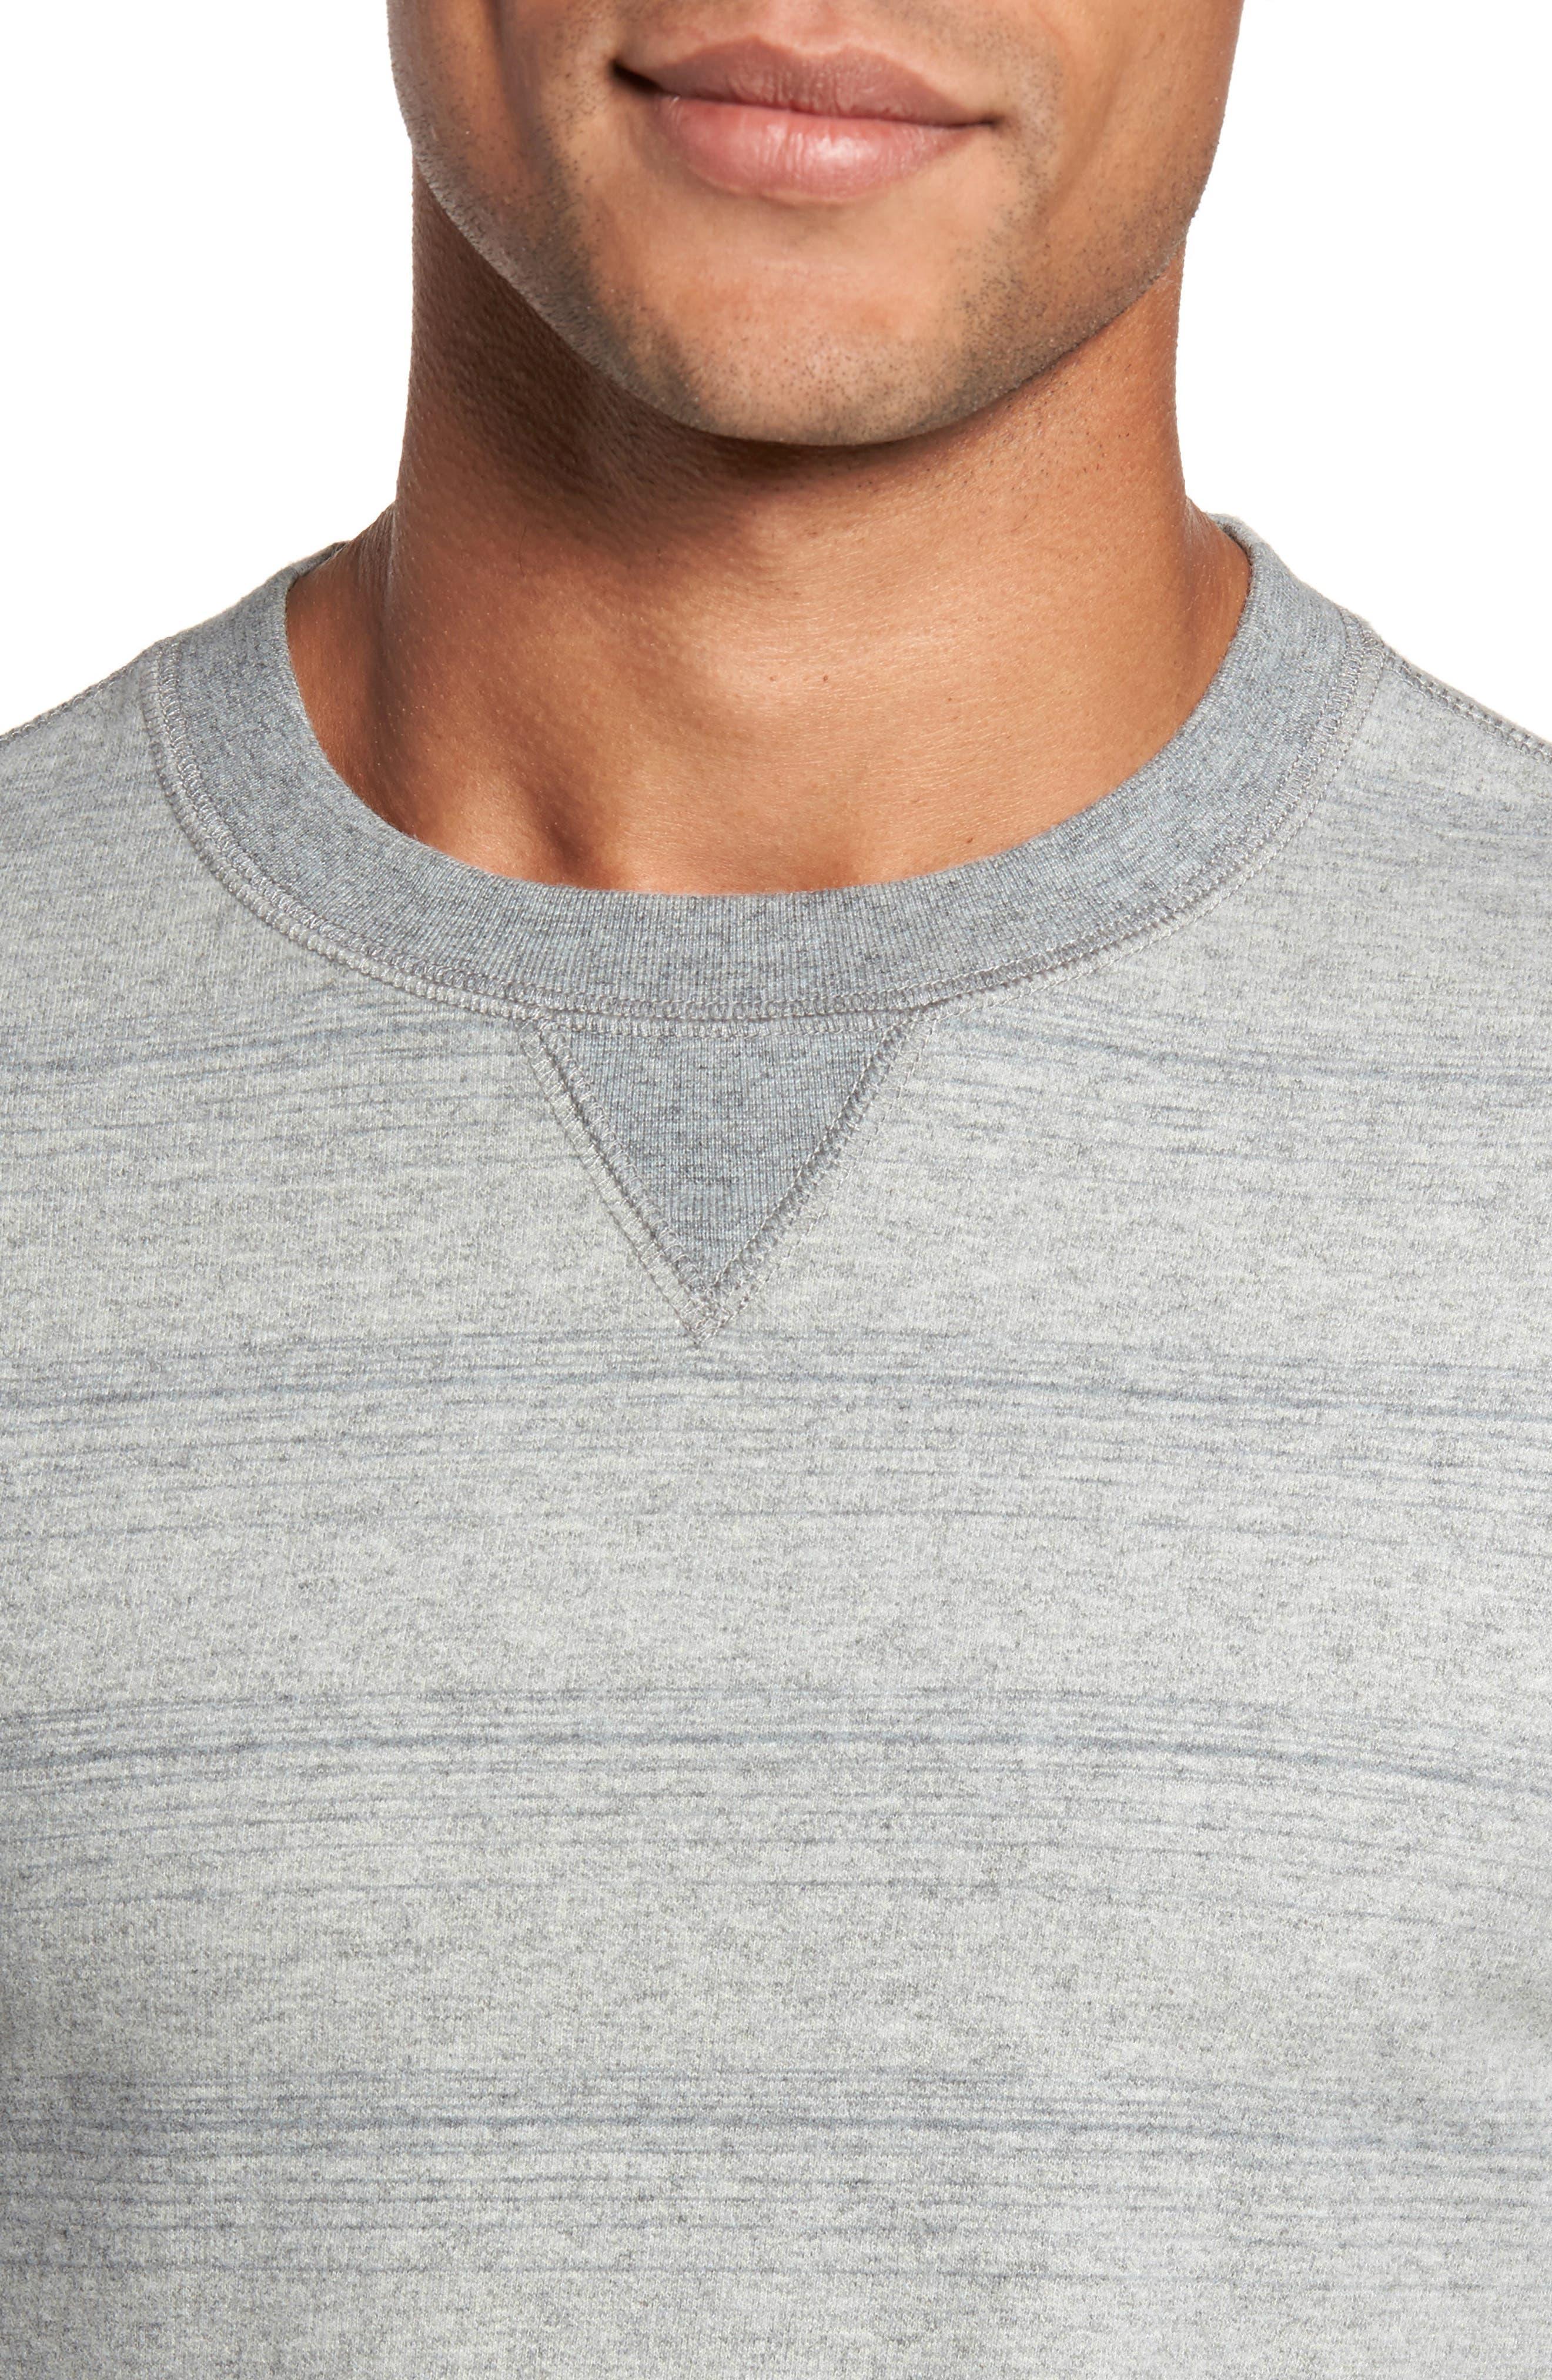 Striped Crewneck Sweater,                             Alternate thumbnail 4, color,                             035